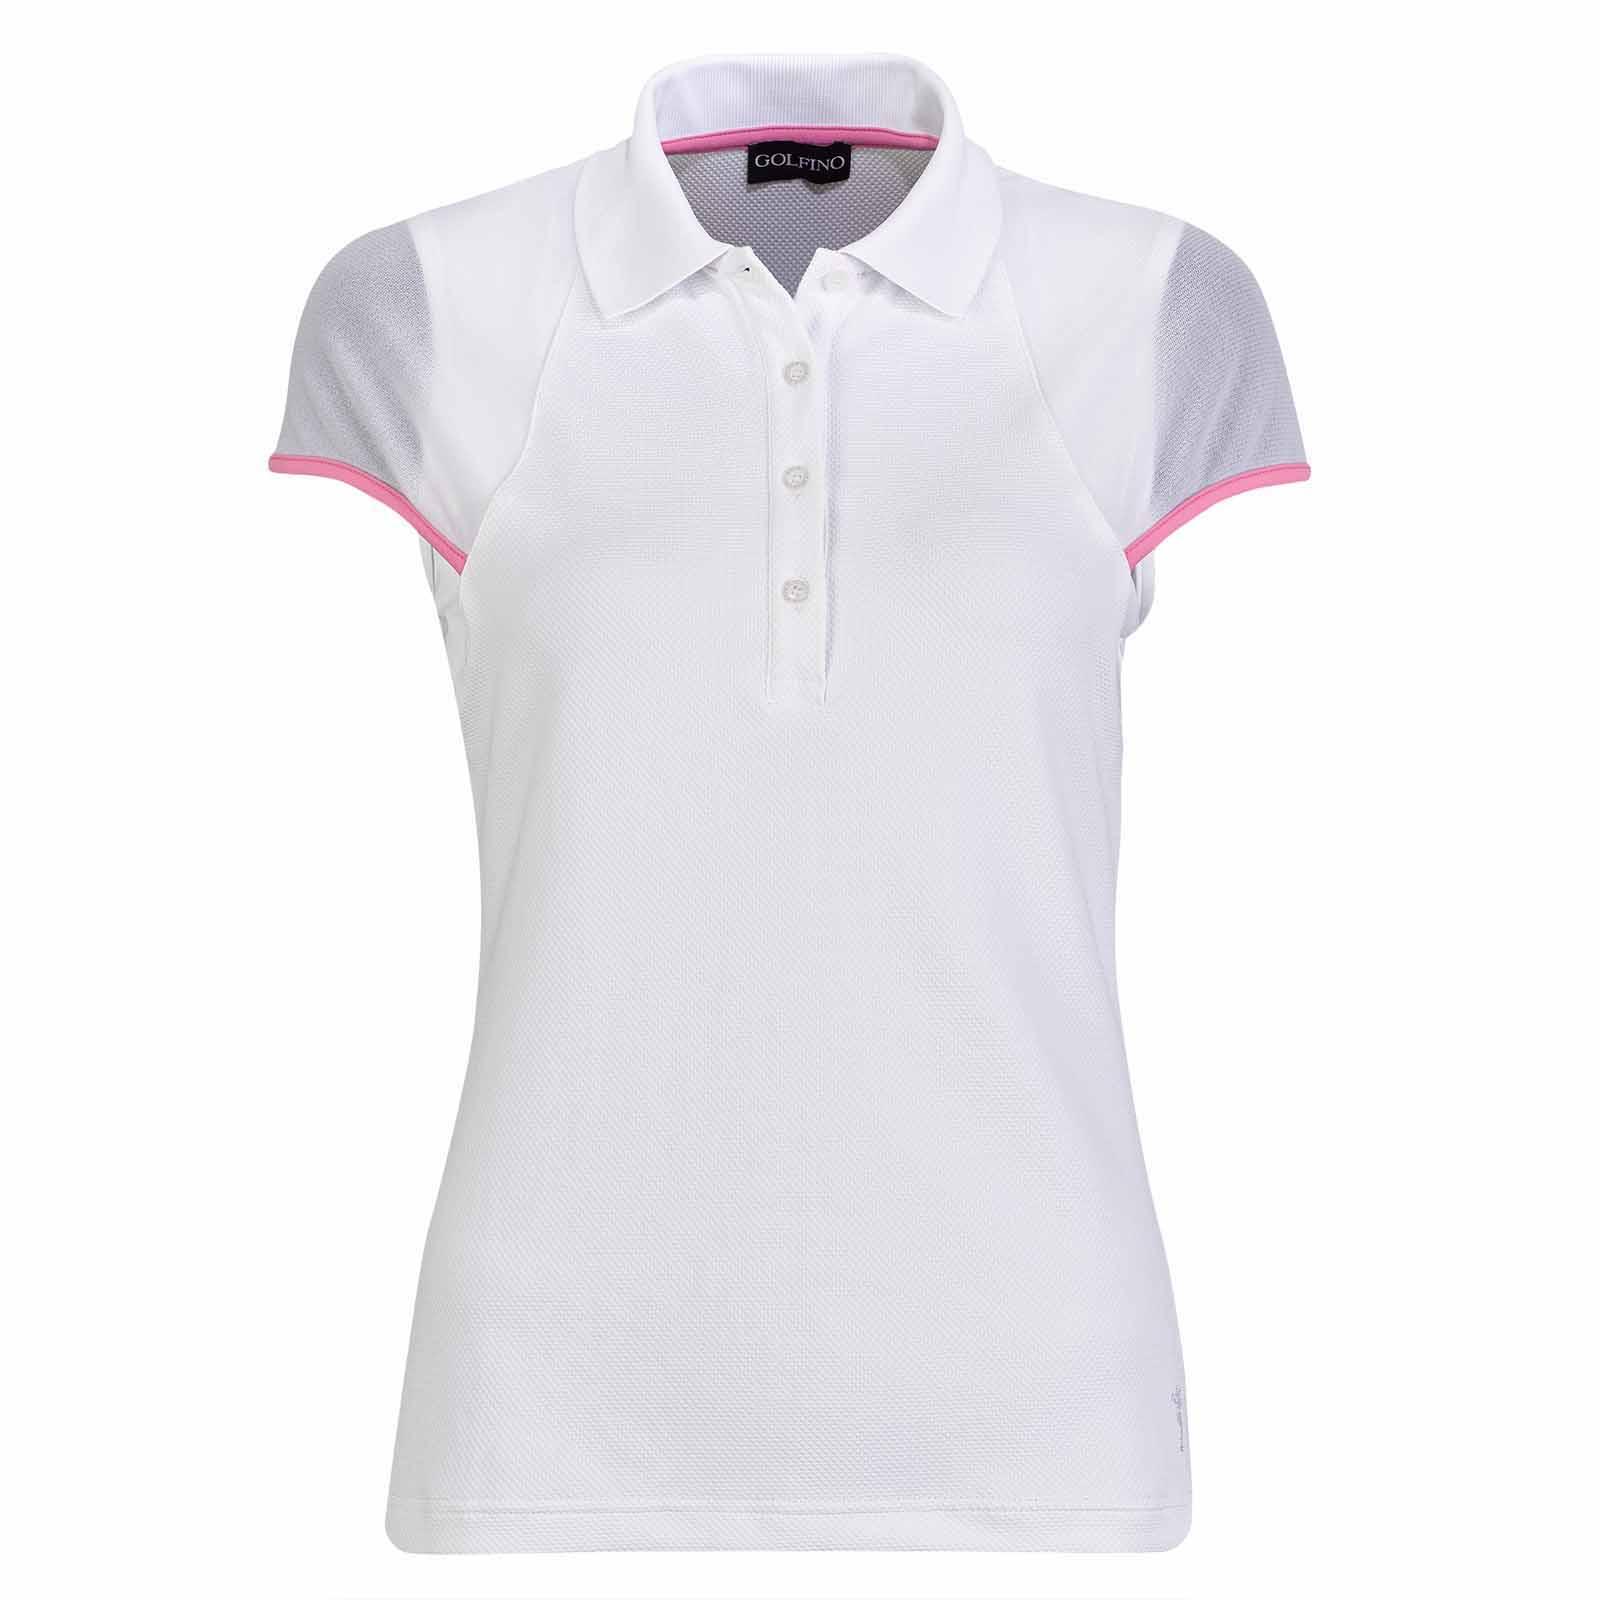 Damen Golf Poloshirt feuchtigkeitsregulierend aus Bubble Jacquard in Slim Fit